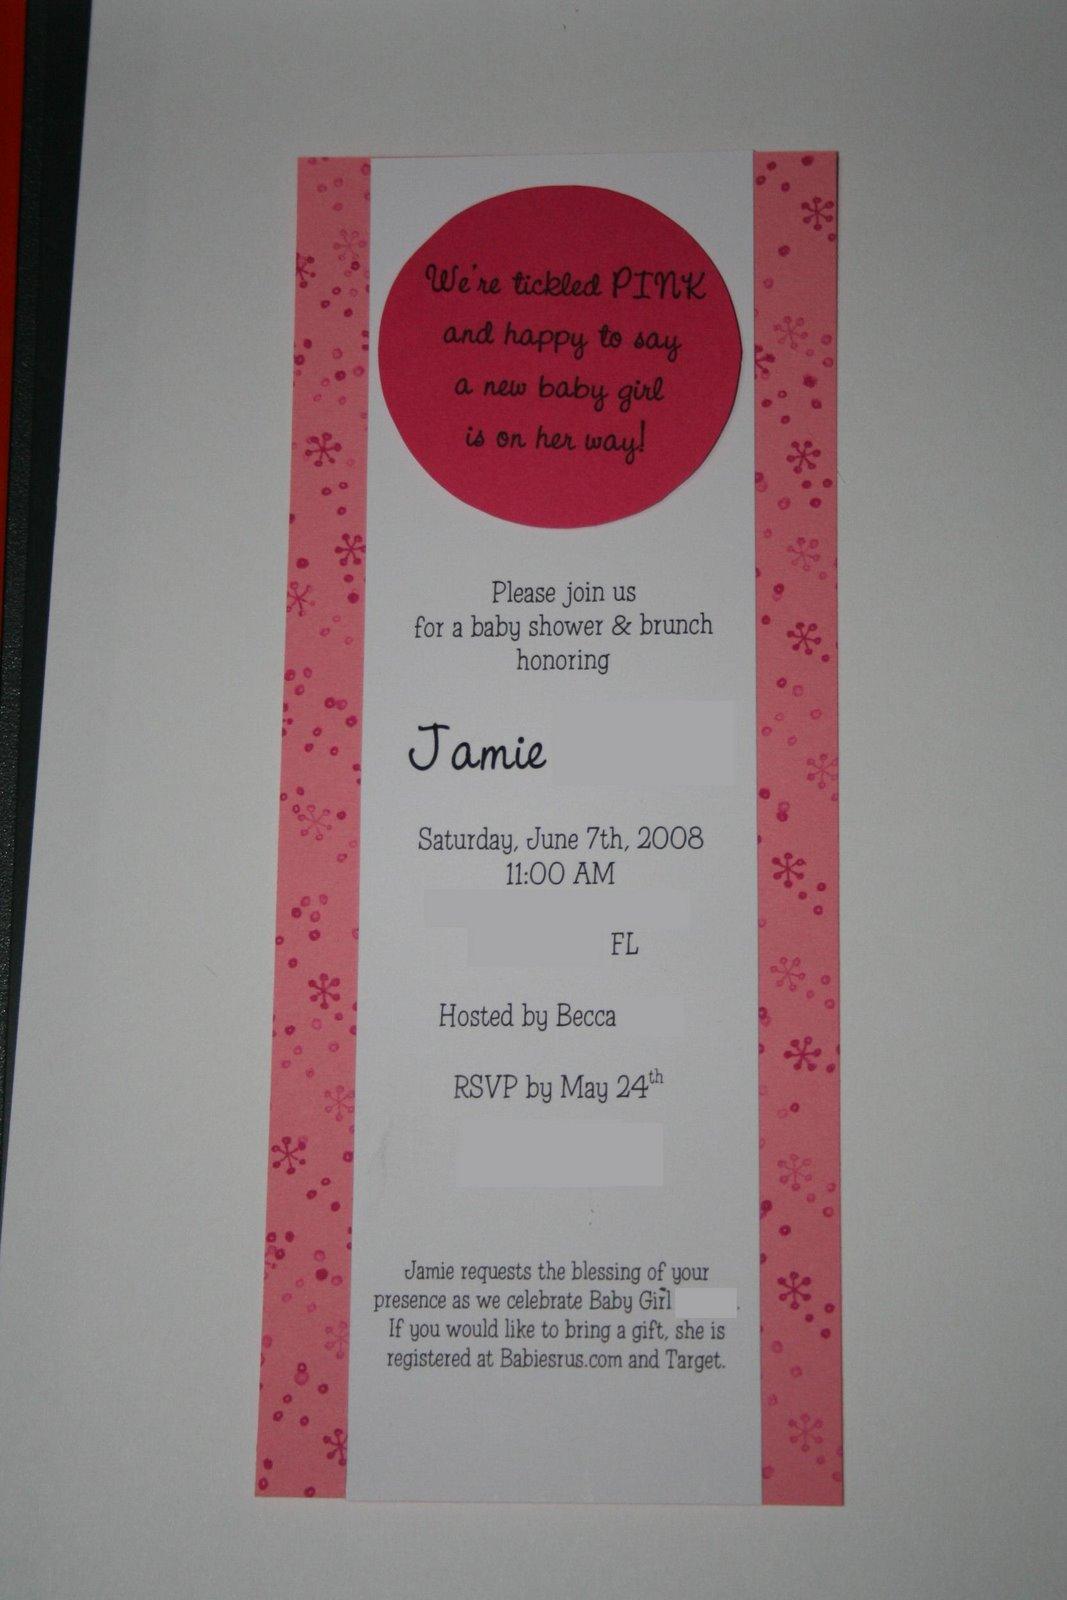 [jamie's+invite+002+edit.JPG]